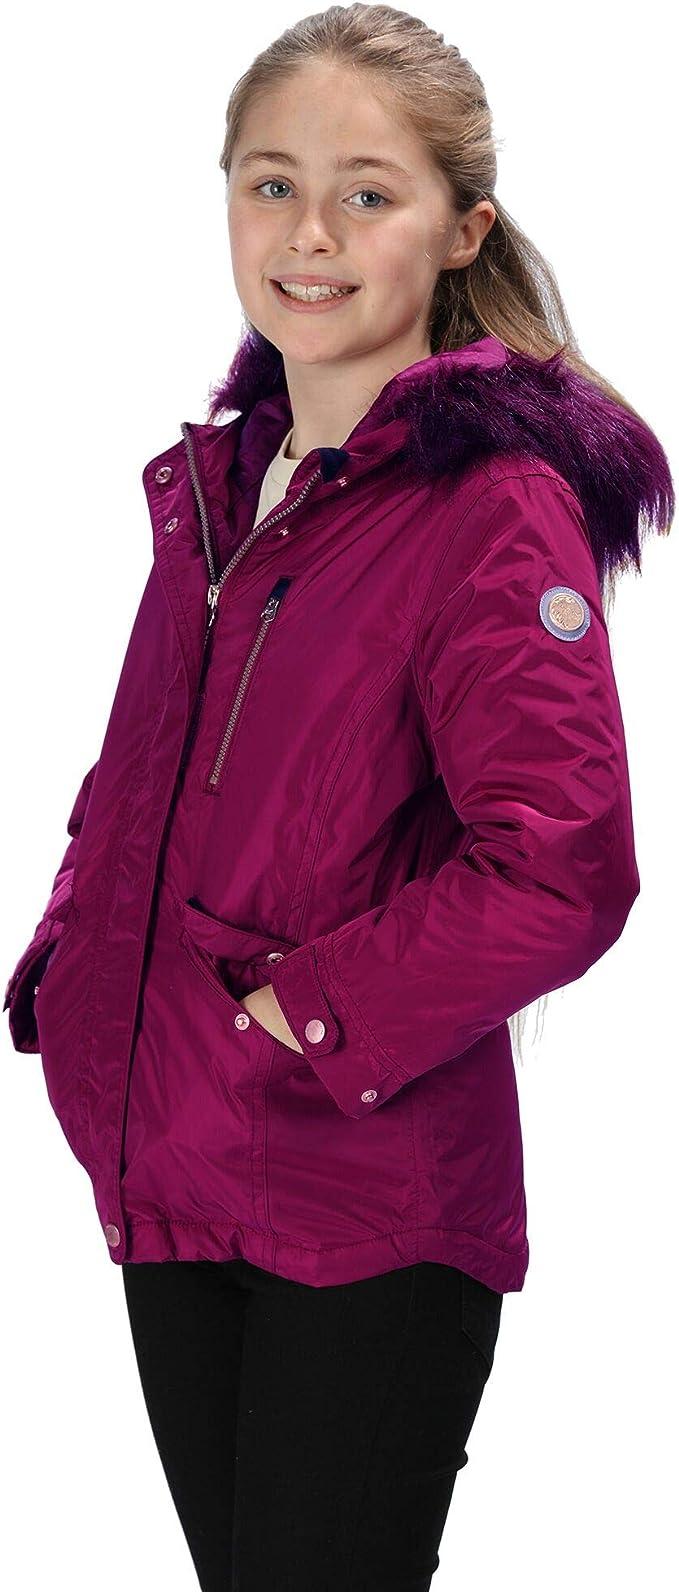 Regatta Kid's 'Palomina' Waterproof Insulated Hooded Jacket,Regatta